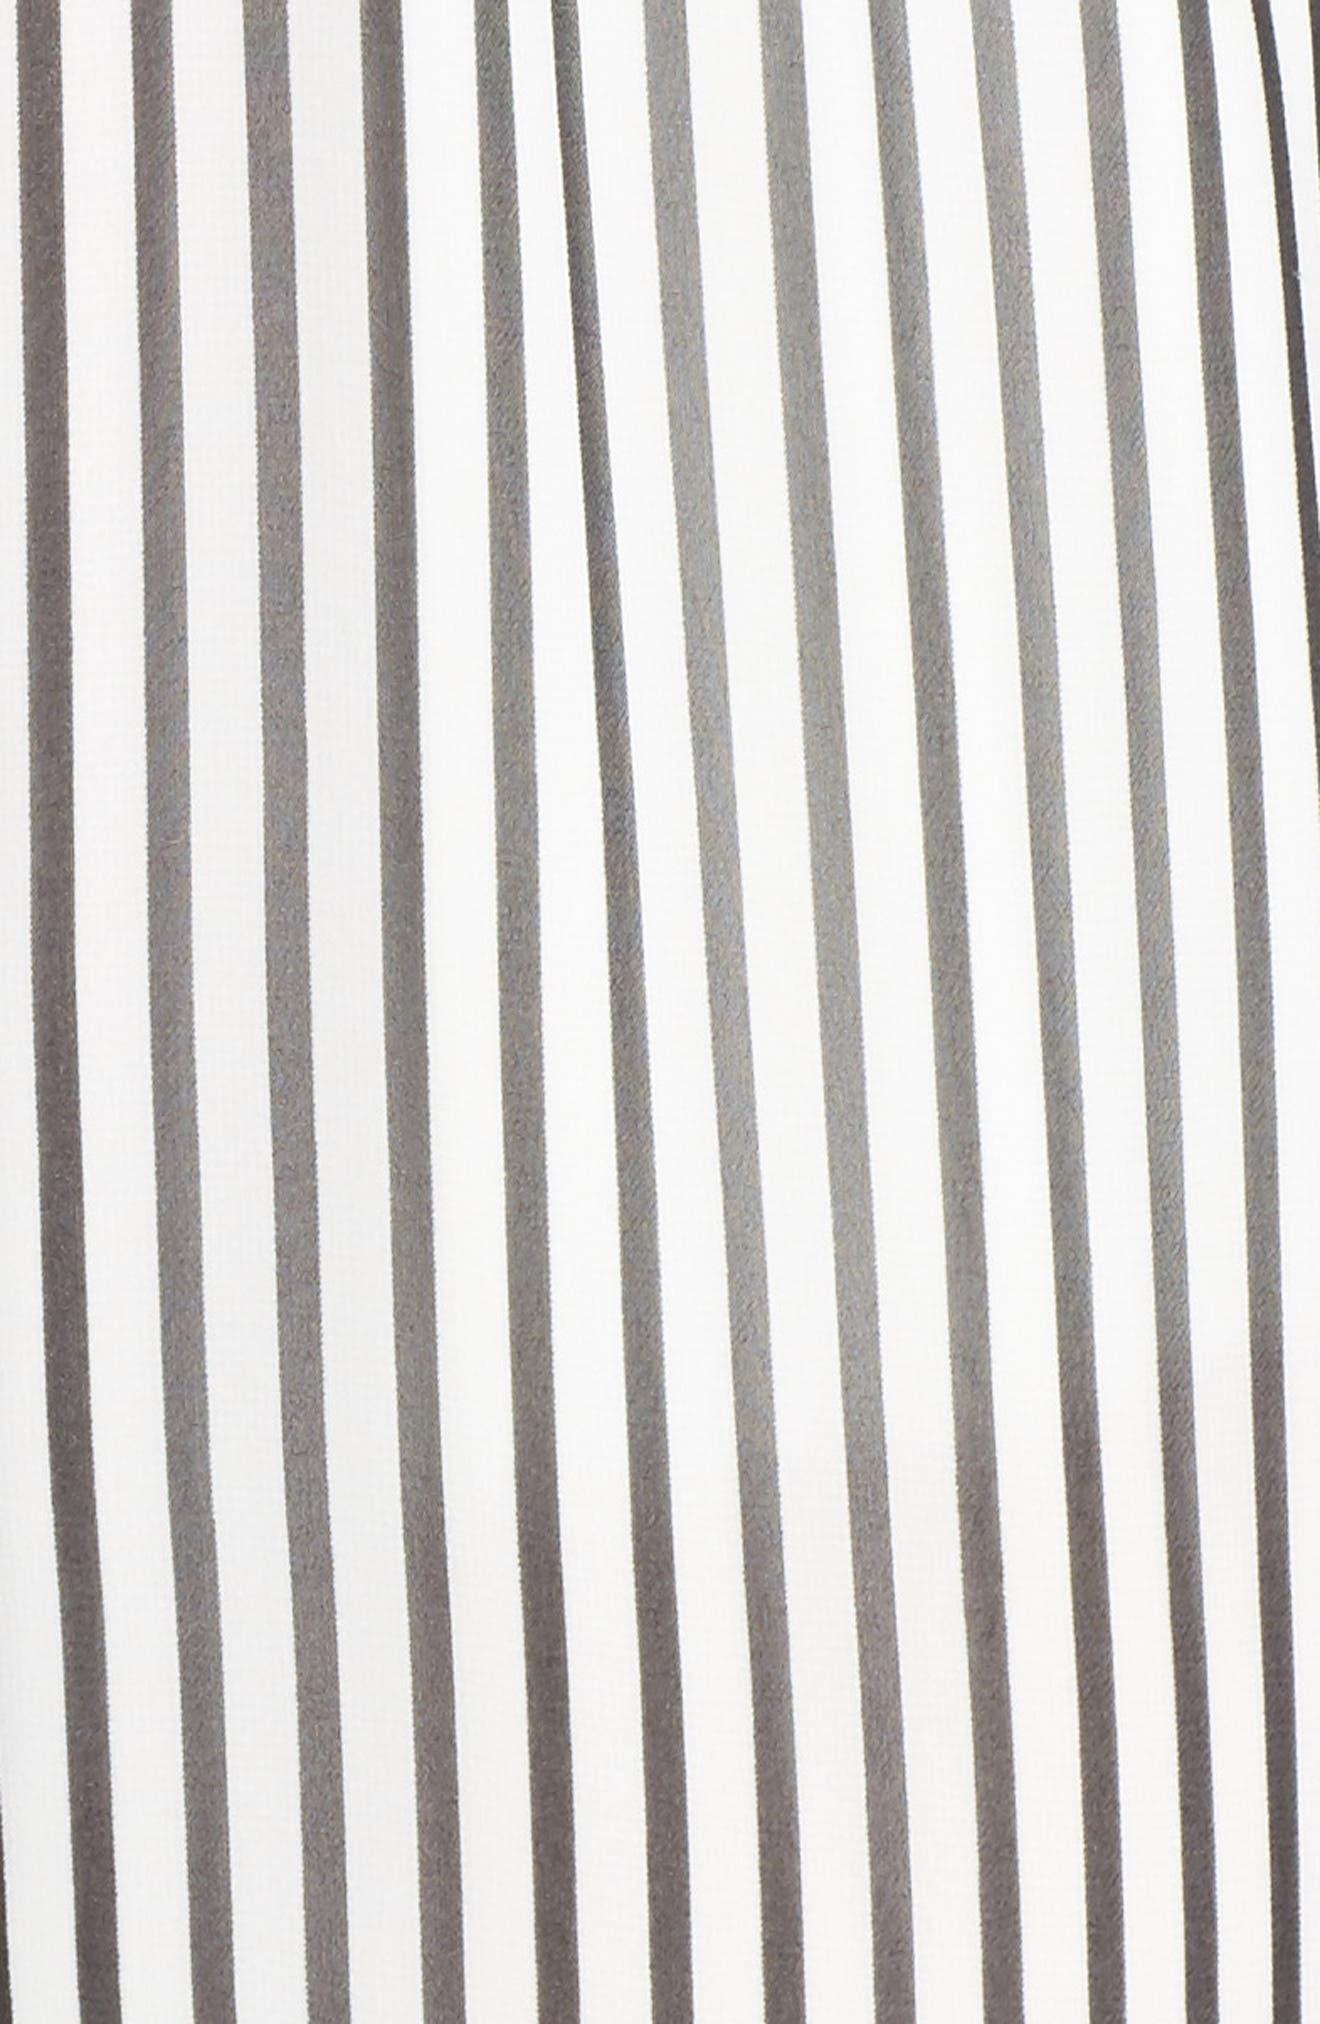 Cherry on Top Stripe Ruffle Jumpsuit,                             Alternate thumbnail 6, color,                             Black/ White Stripe